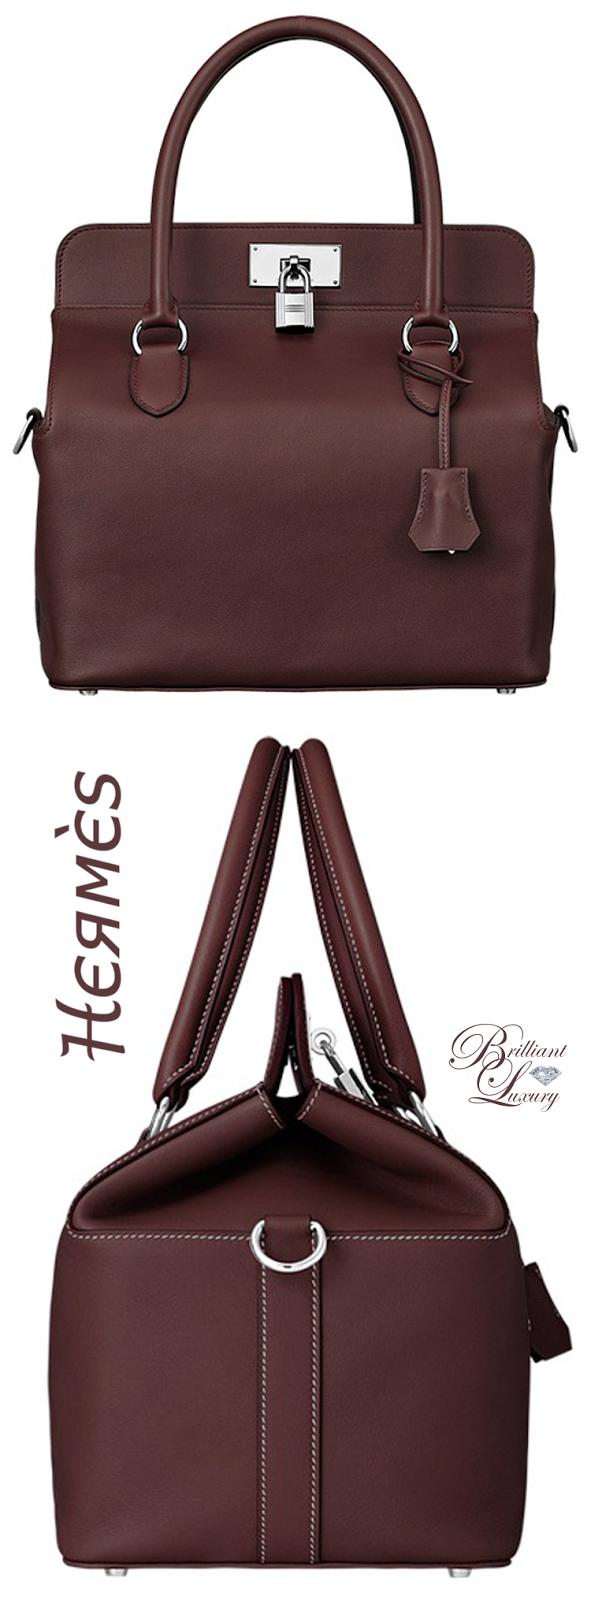 Brilliant Luxury ♦ Hermès 'Toolbox' Bag